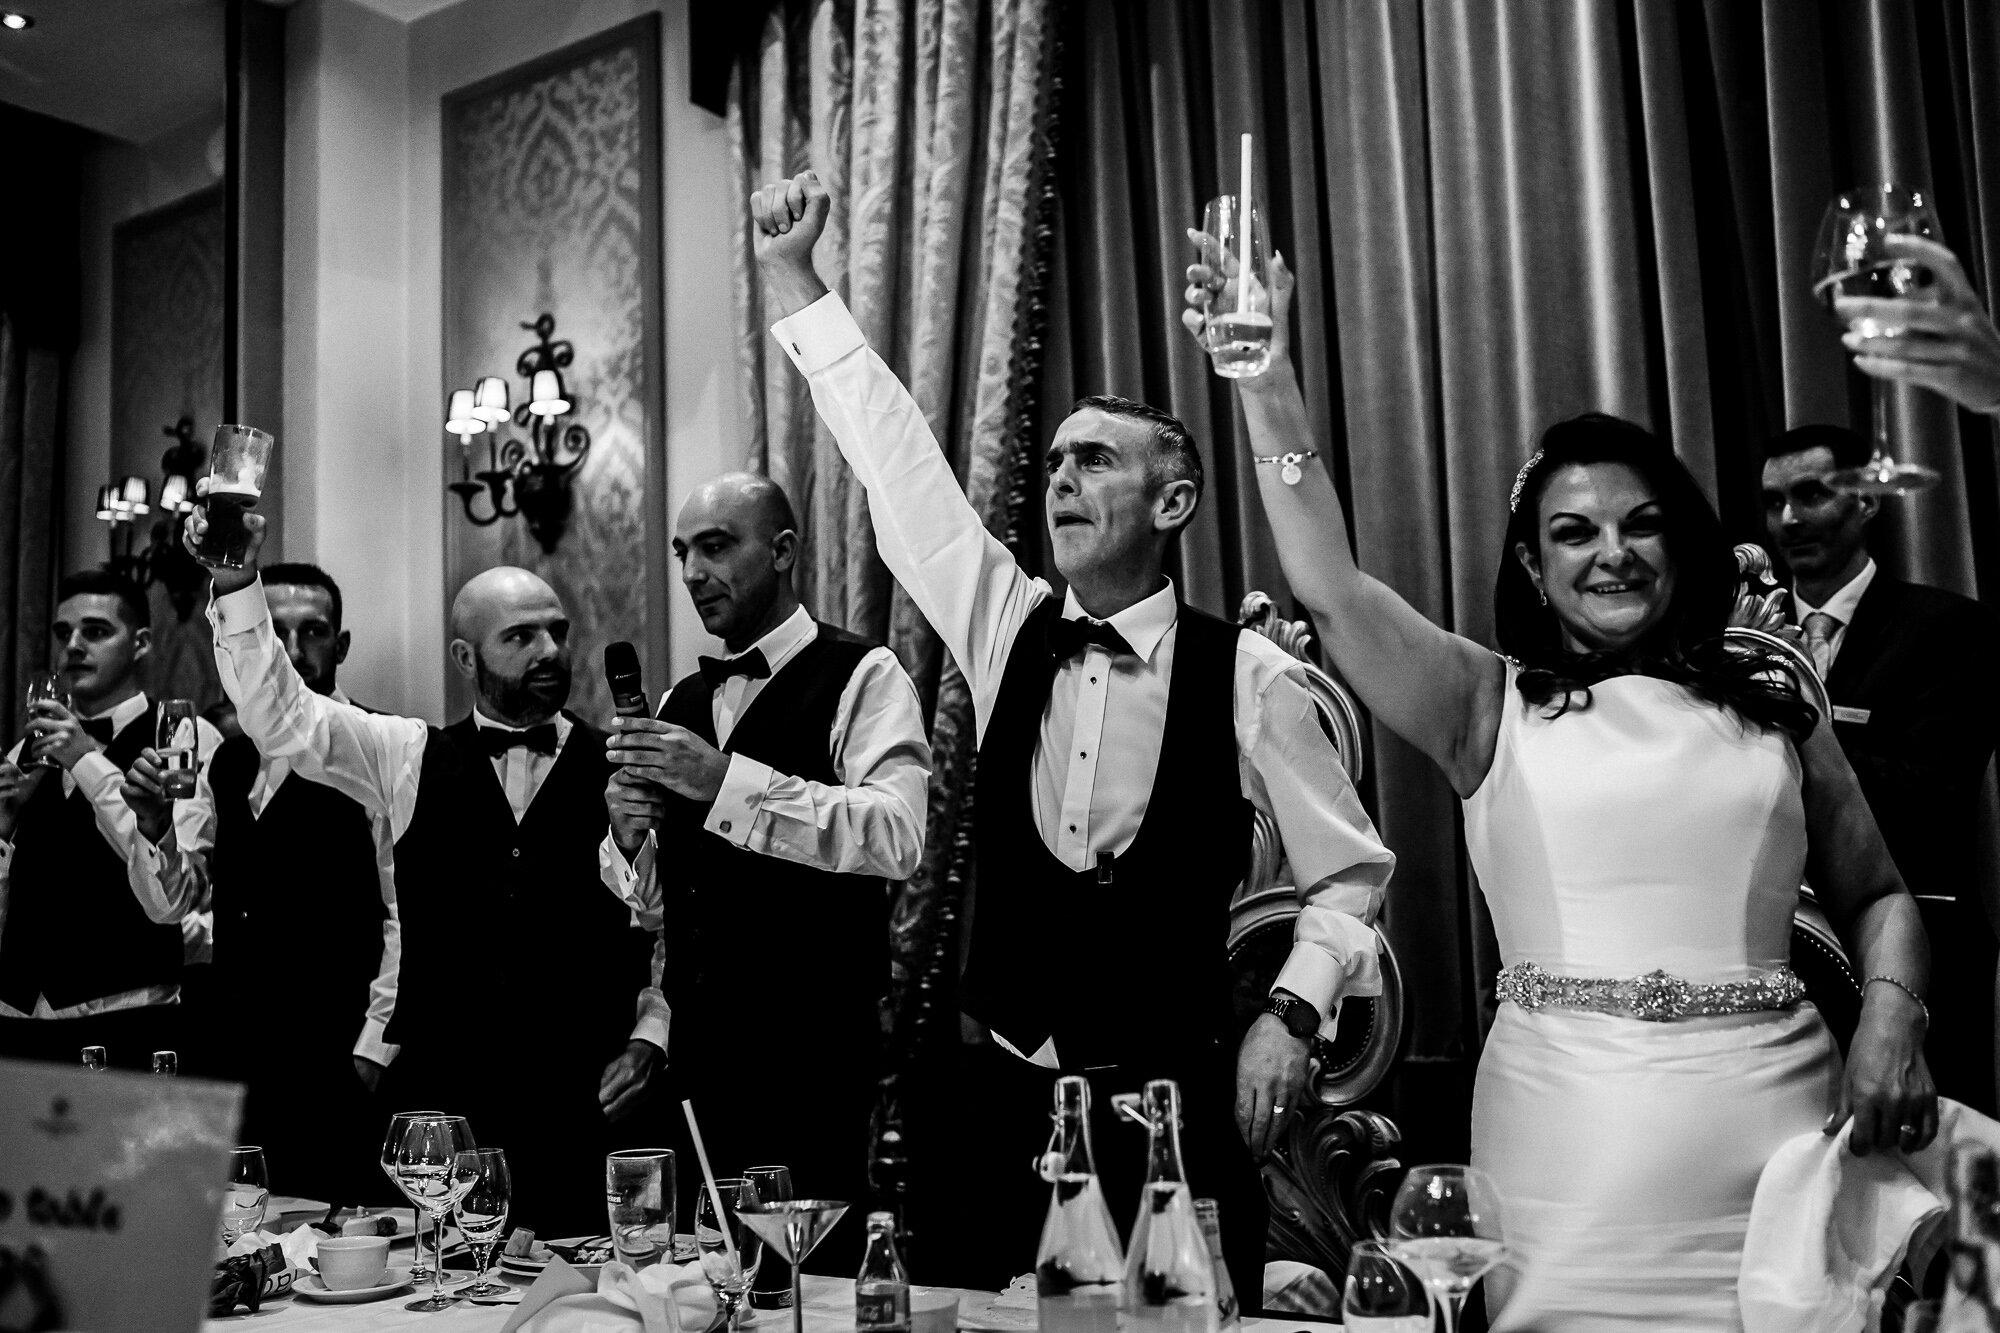 Clontarf Caste wedding photographer Wedding Photography dublin ireland wedding photographer (49 of 58).jpg